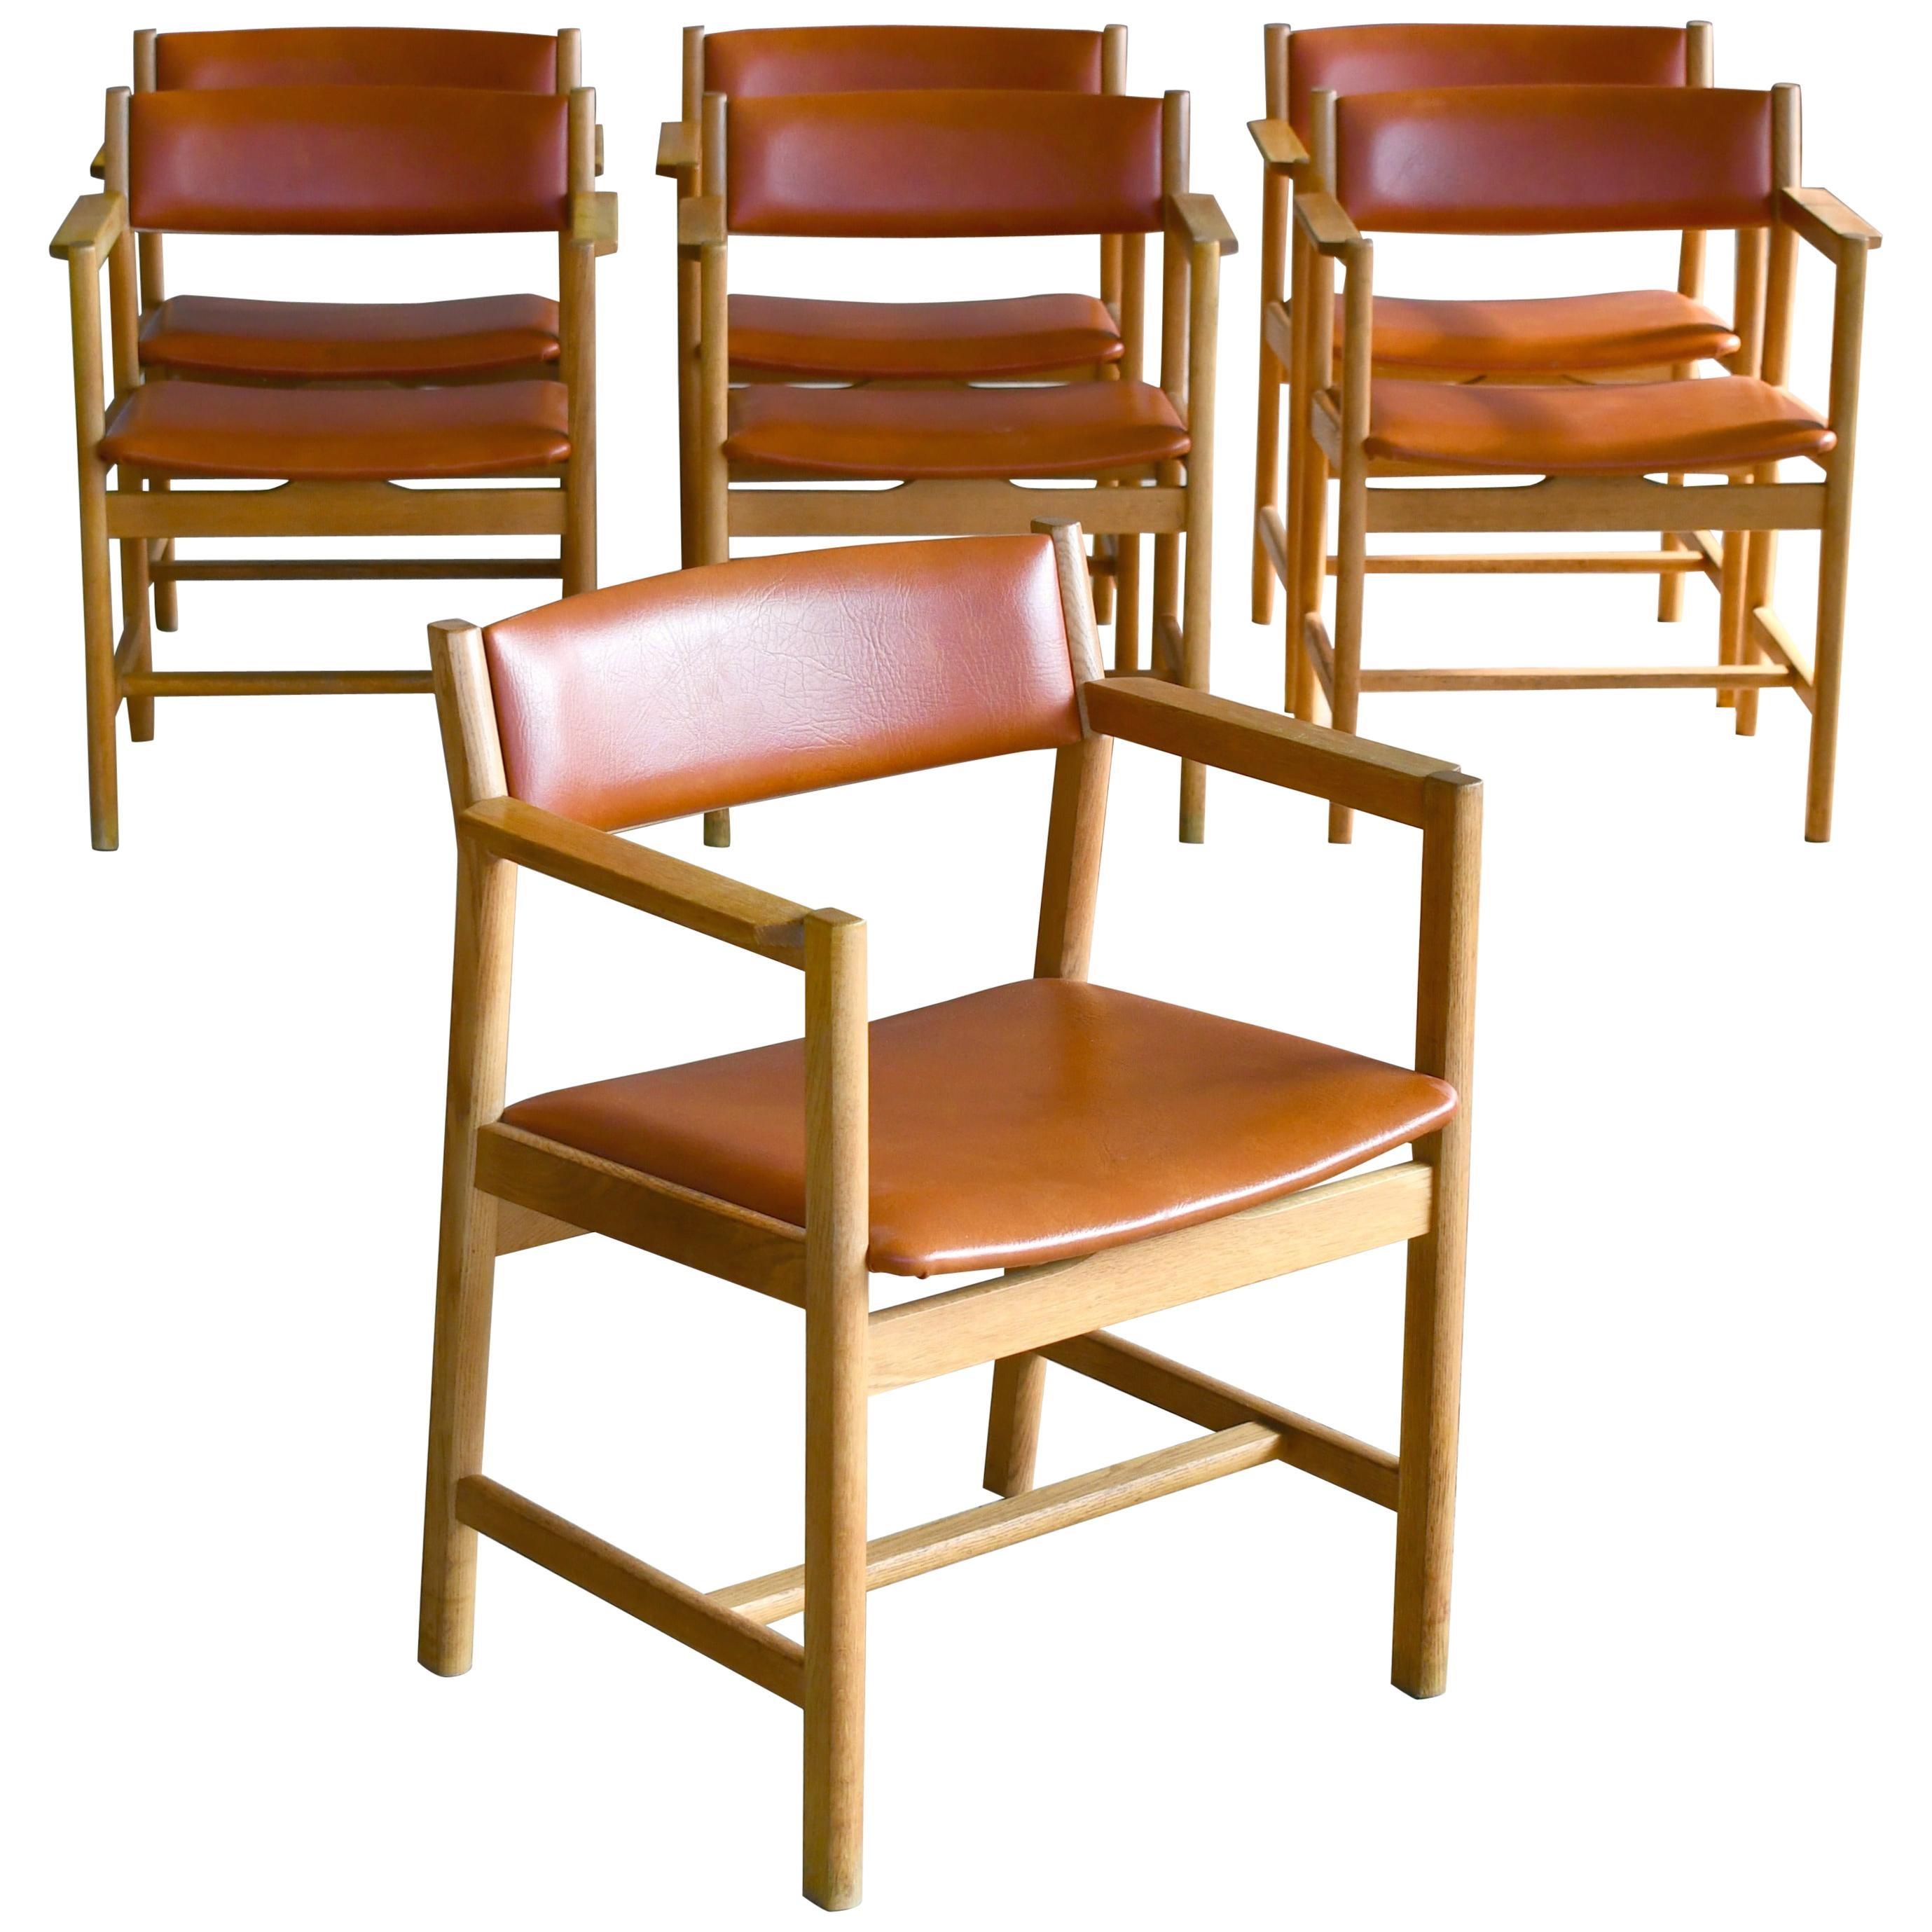 Set of Seven Børge Mogensen Dining Chairs Model 101 in Oak Danish Midcentury